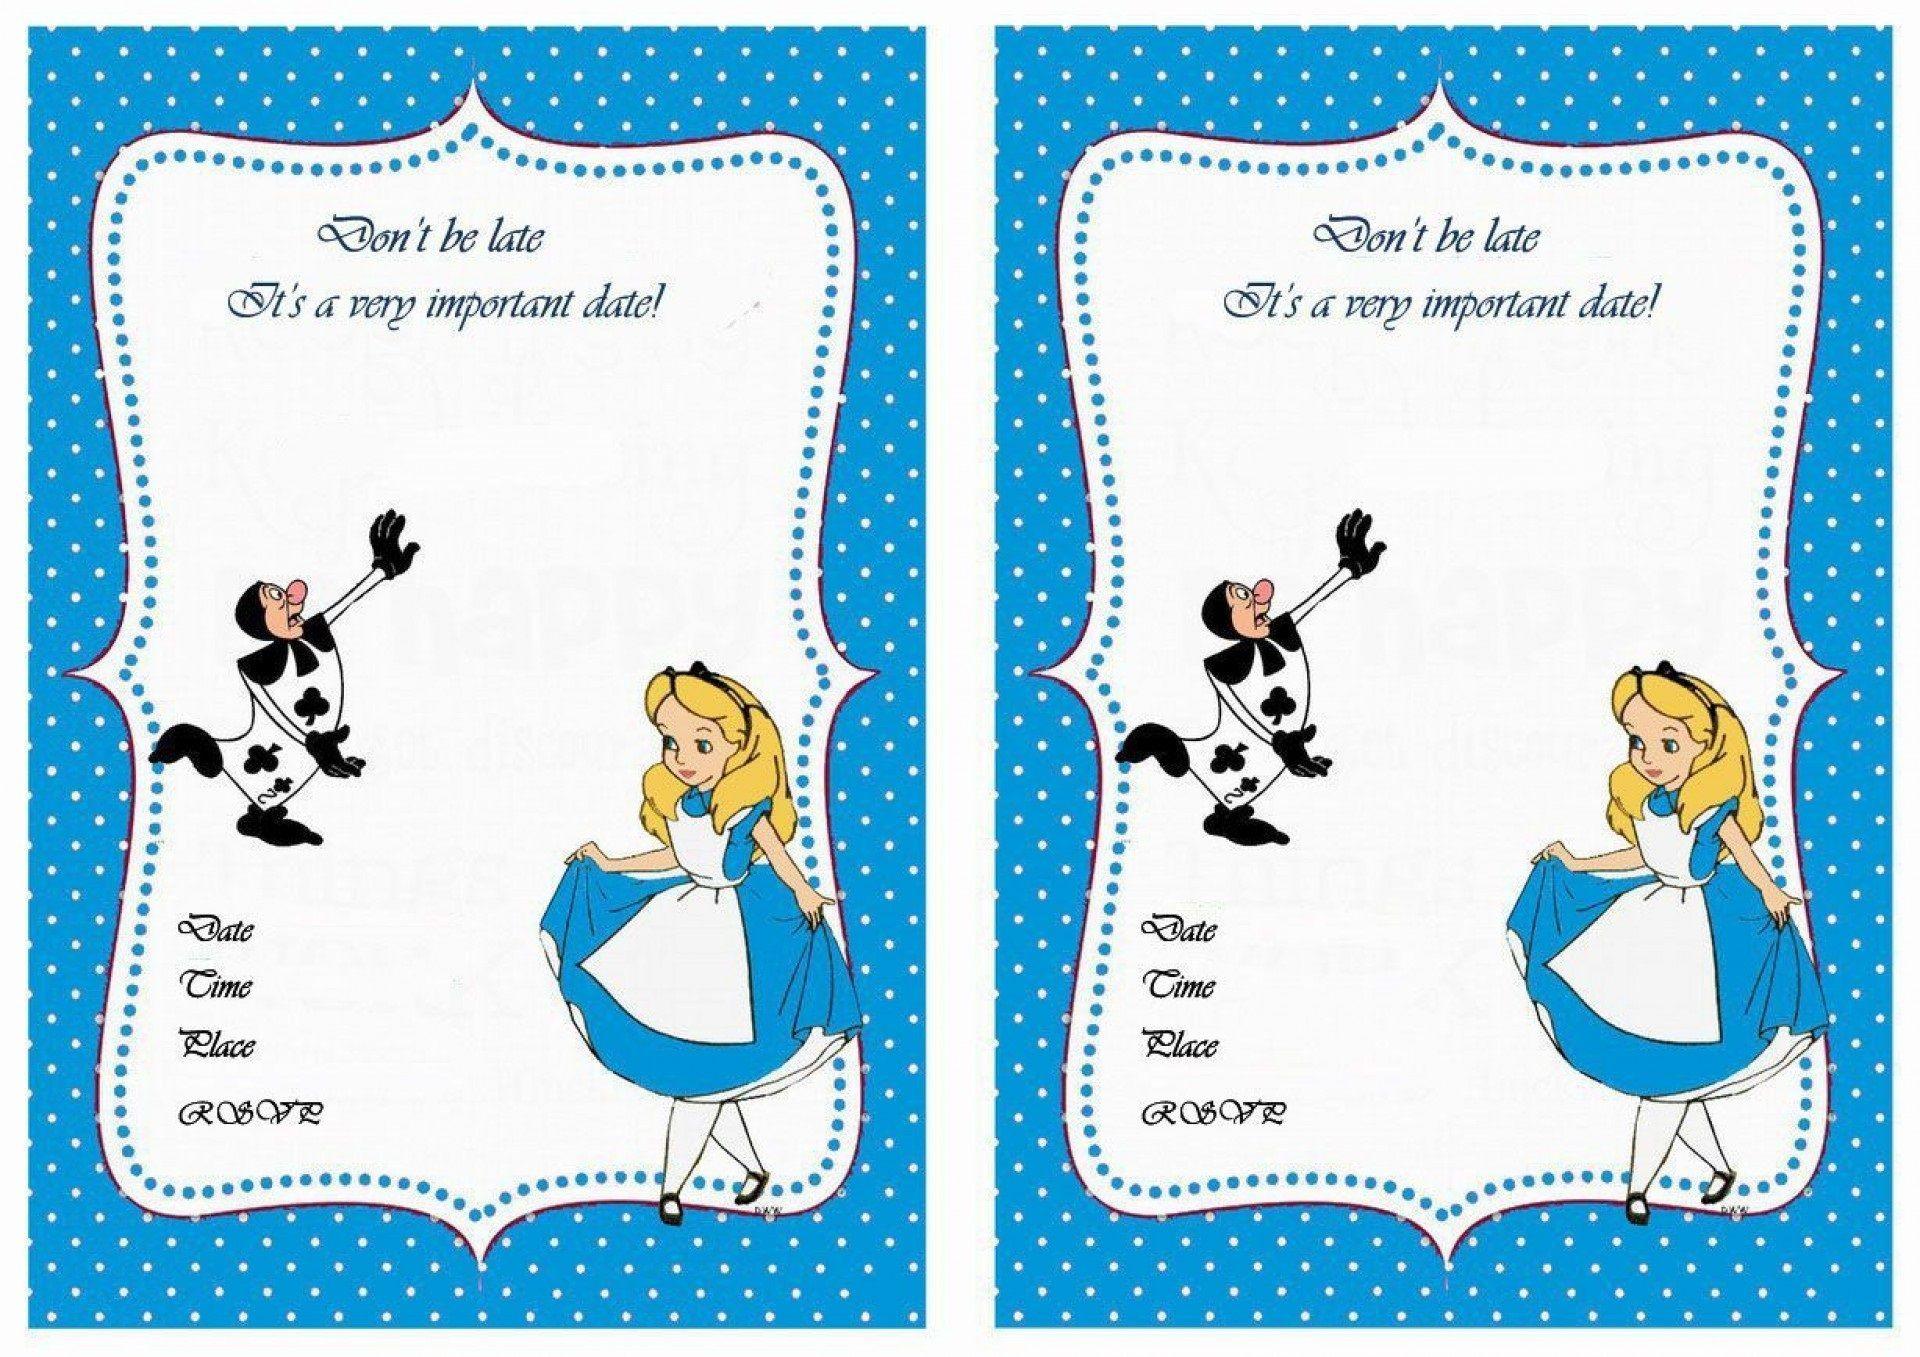 007 Marvelou Alice In Wonderland Invitation Template Download Photo  Free1920